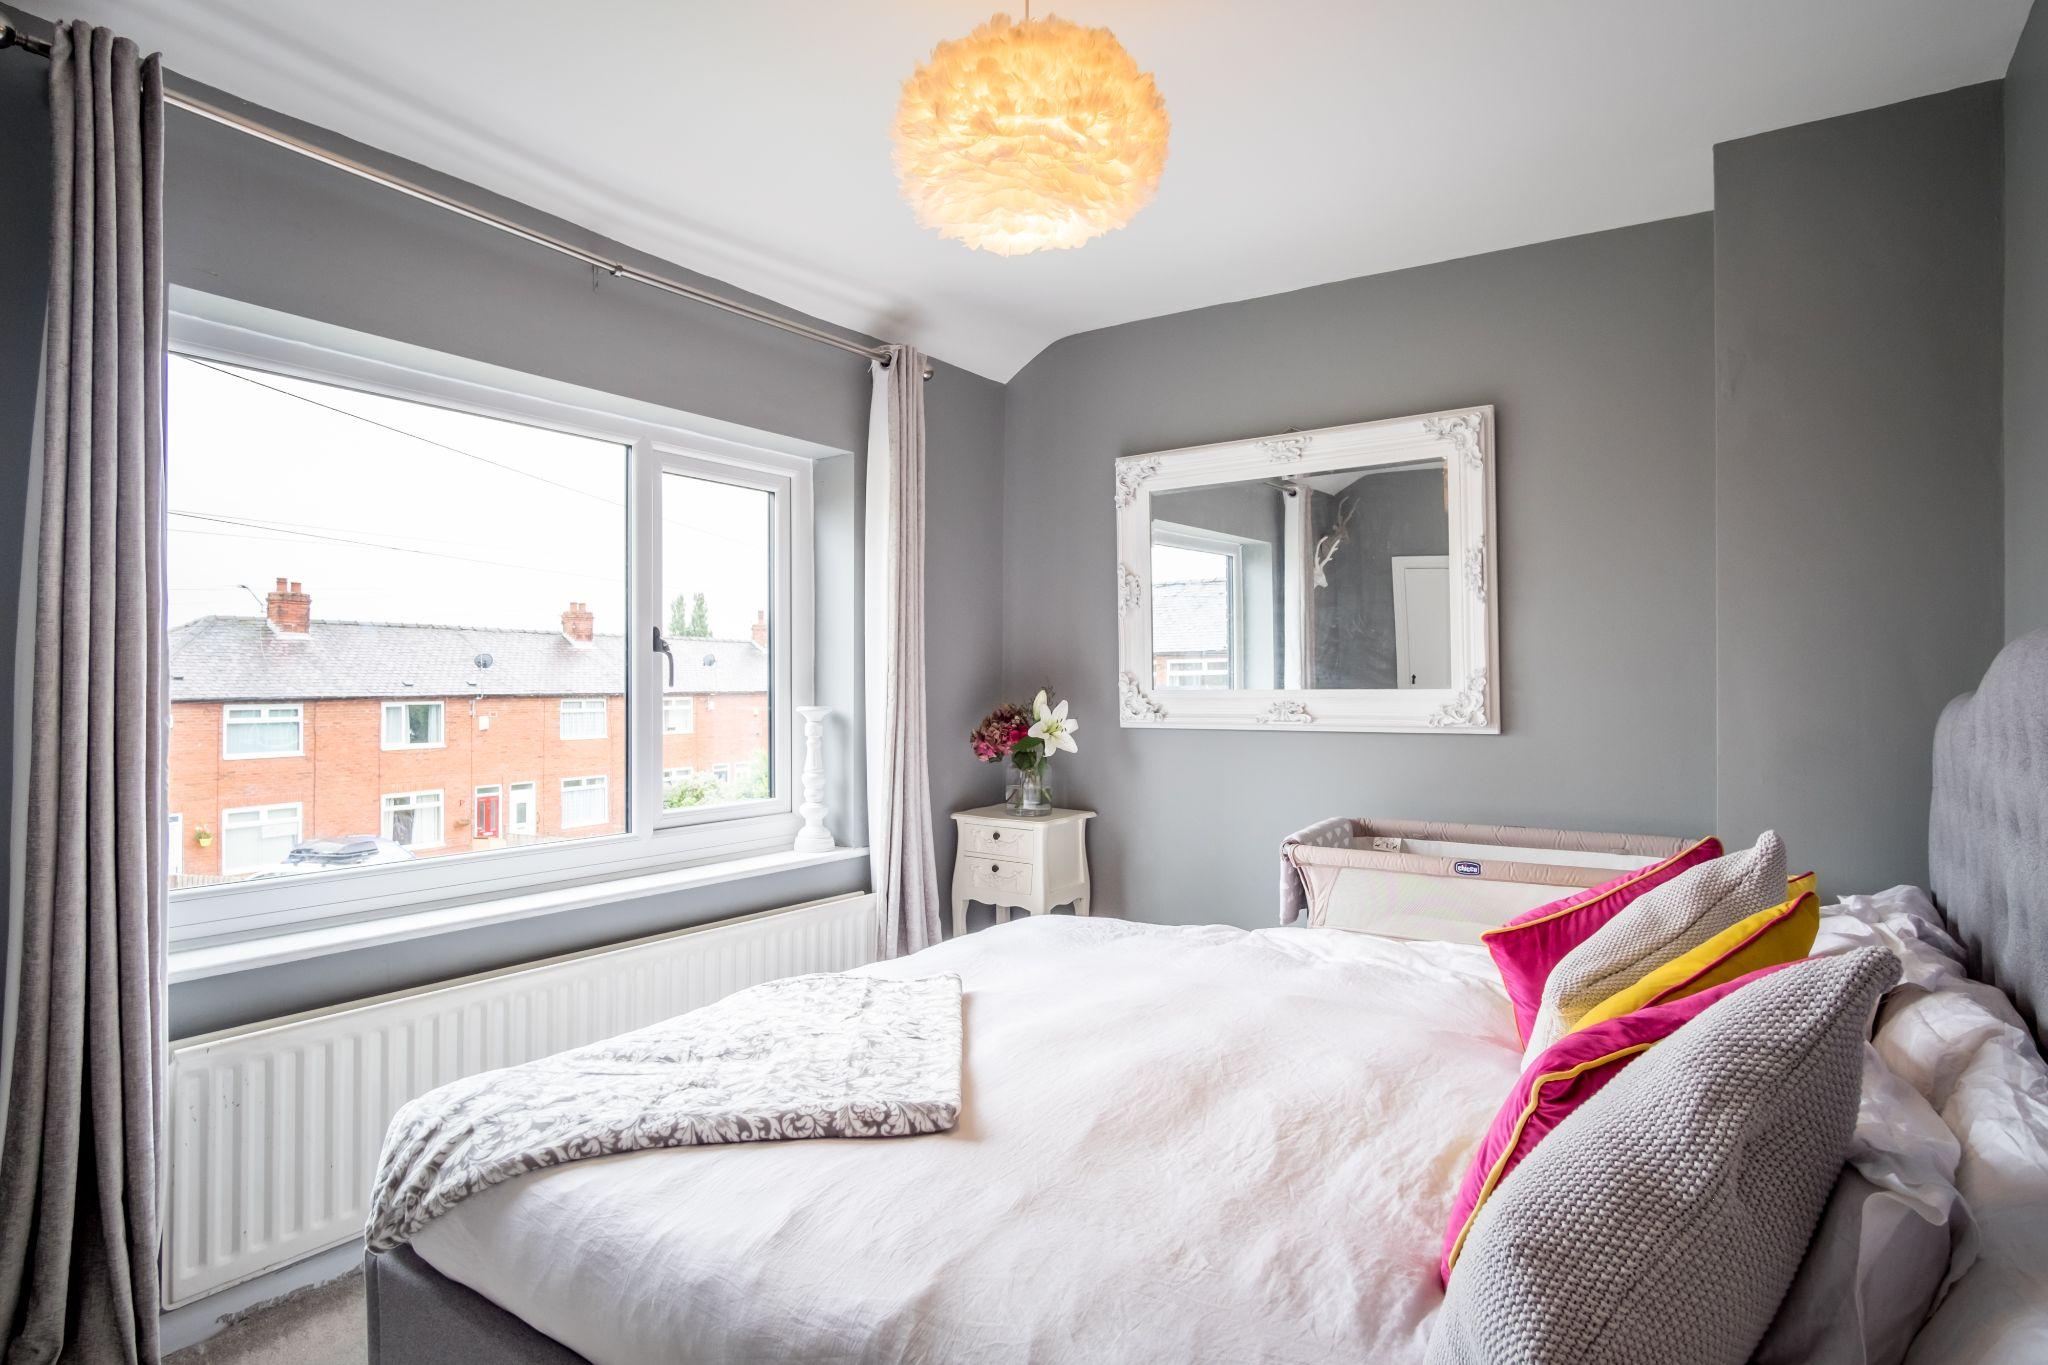 3 bedroom mid terraced house For Sale in Halifax - Bedroom 1